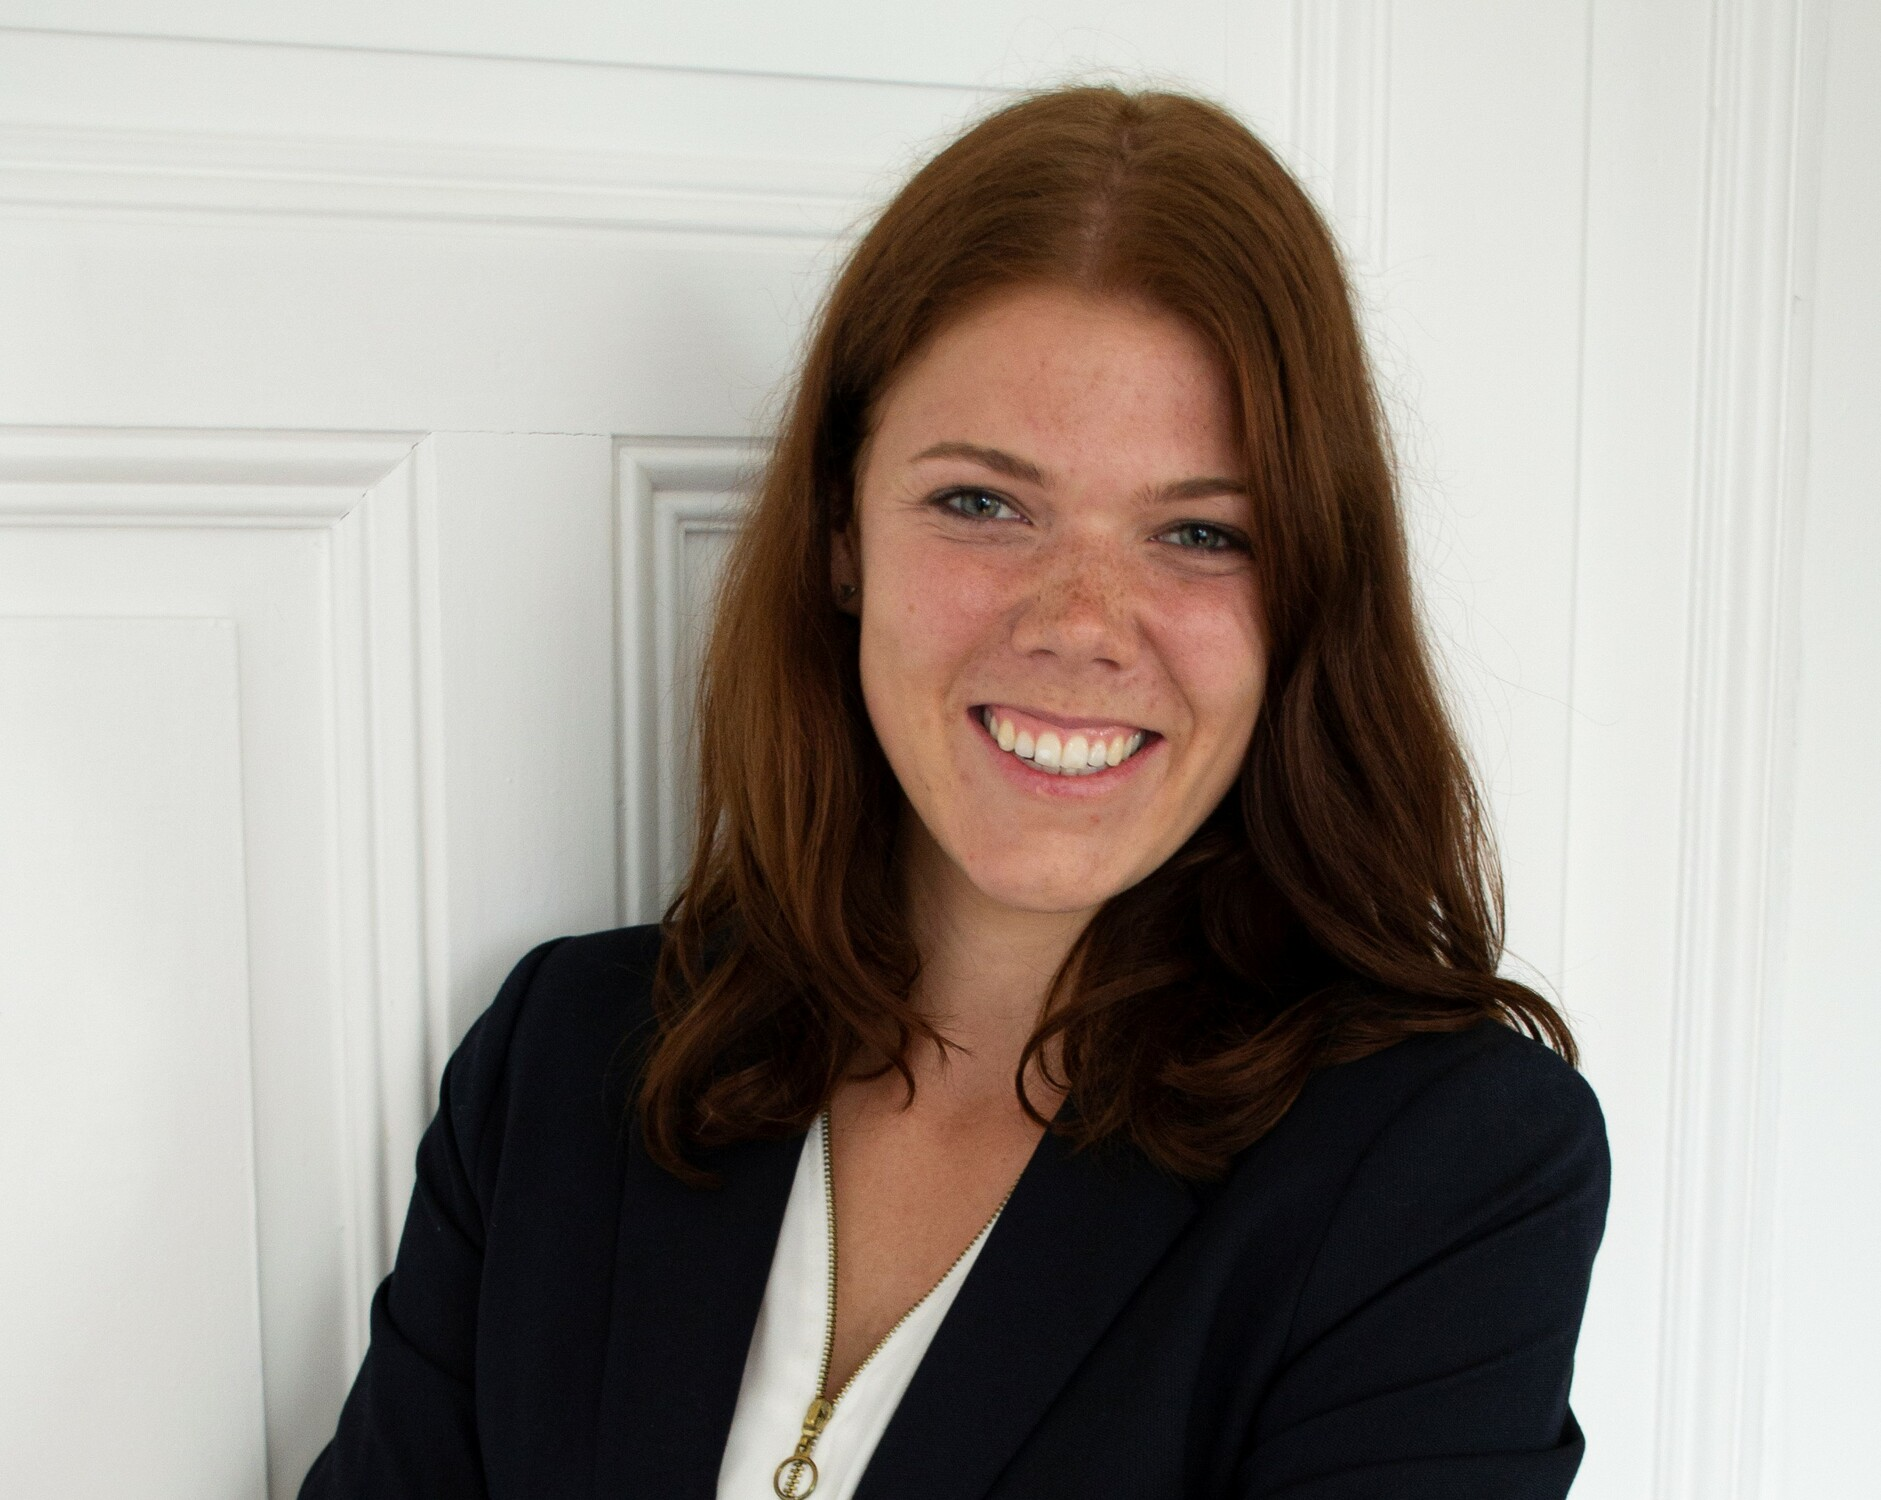 LVN-Mitarbeiterin Christina Brandenburg